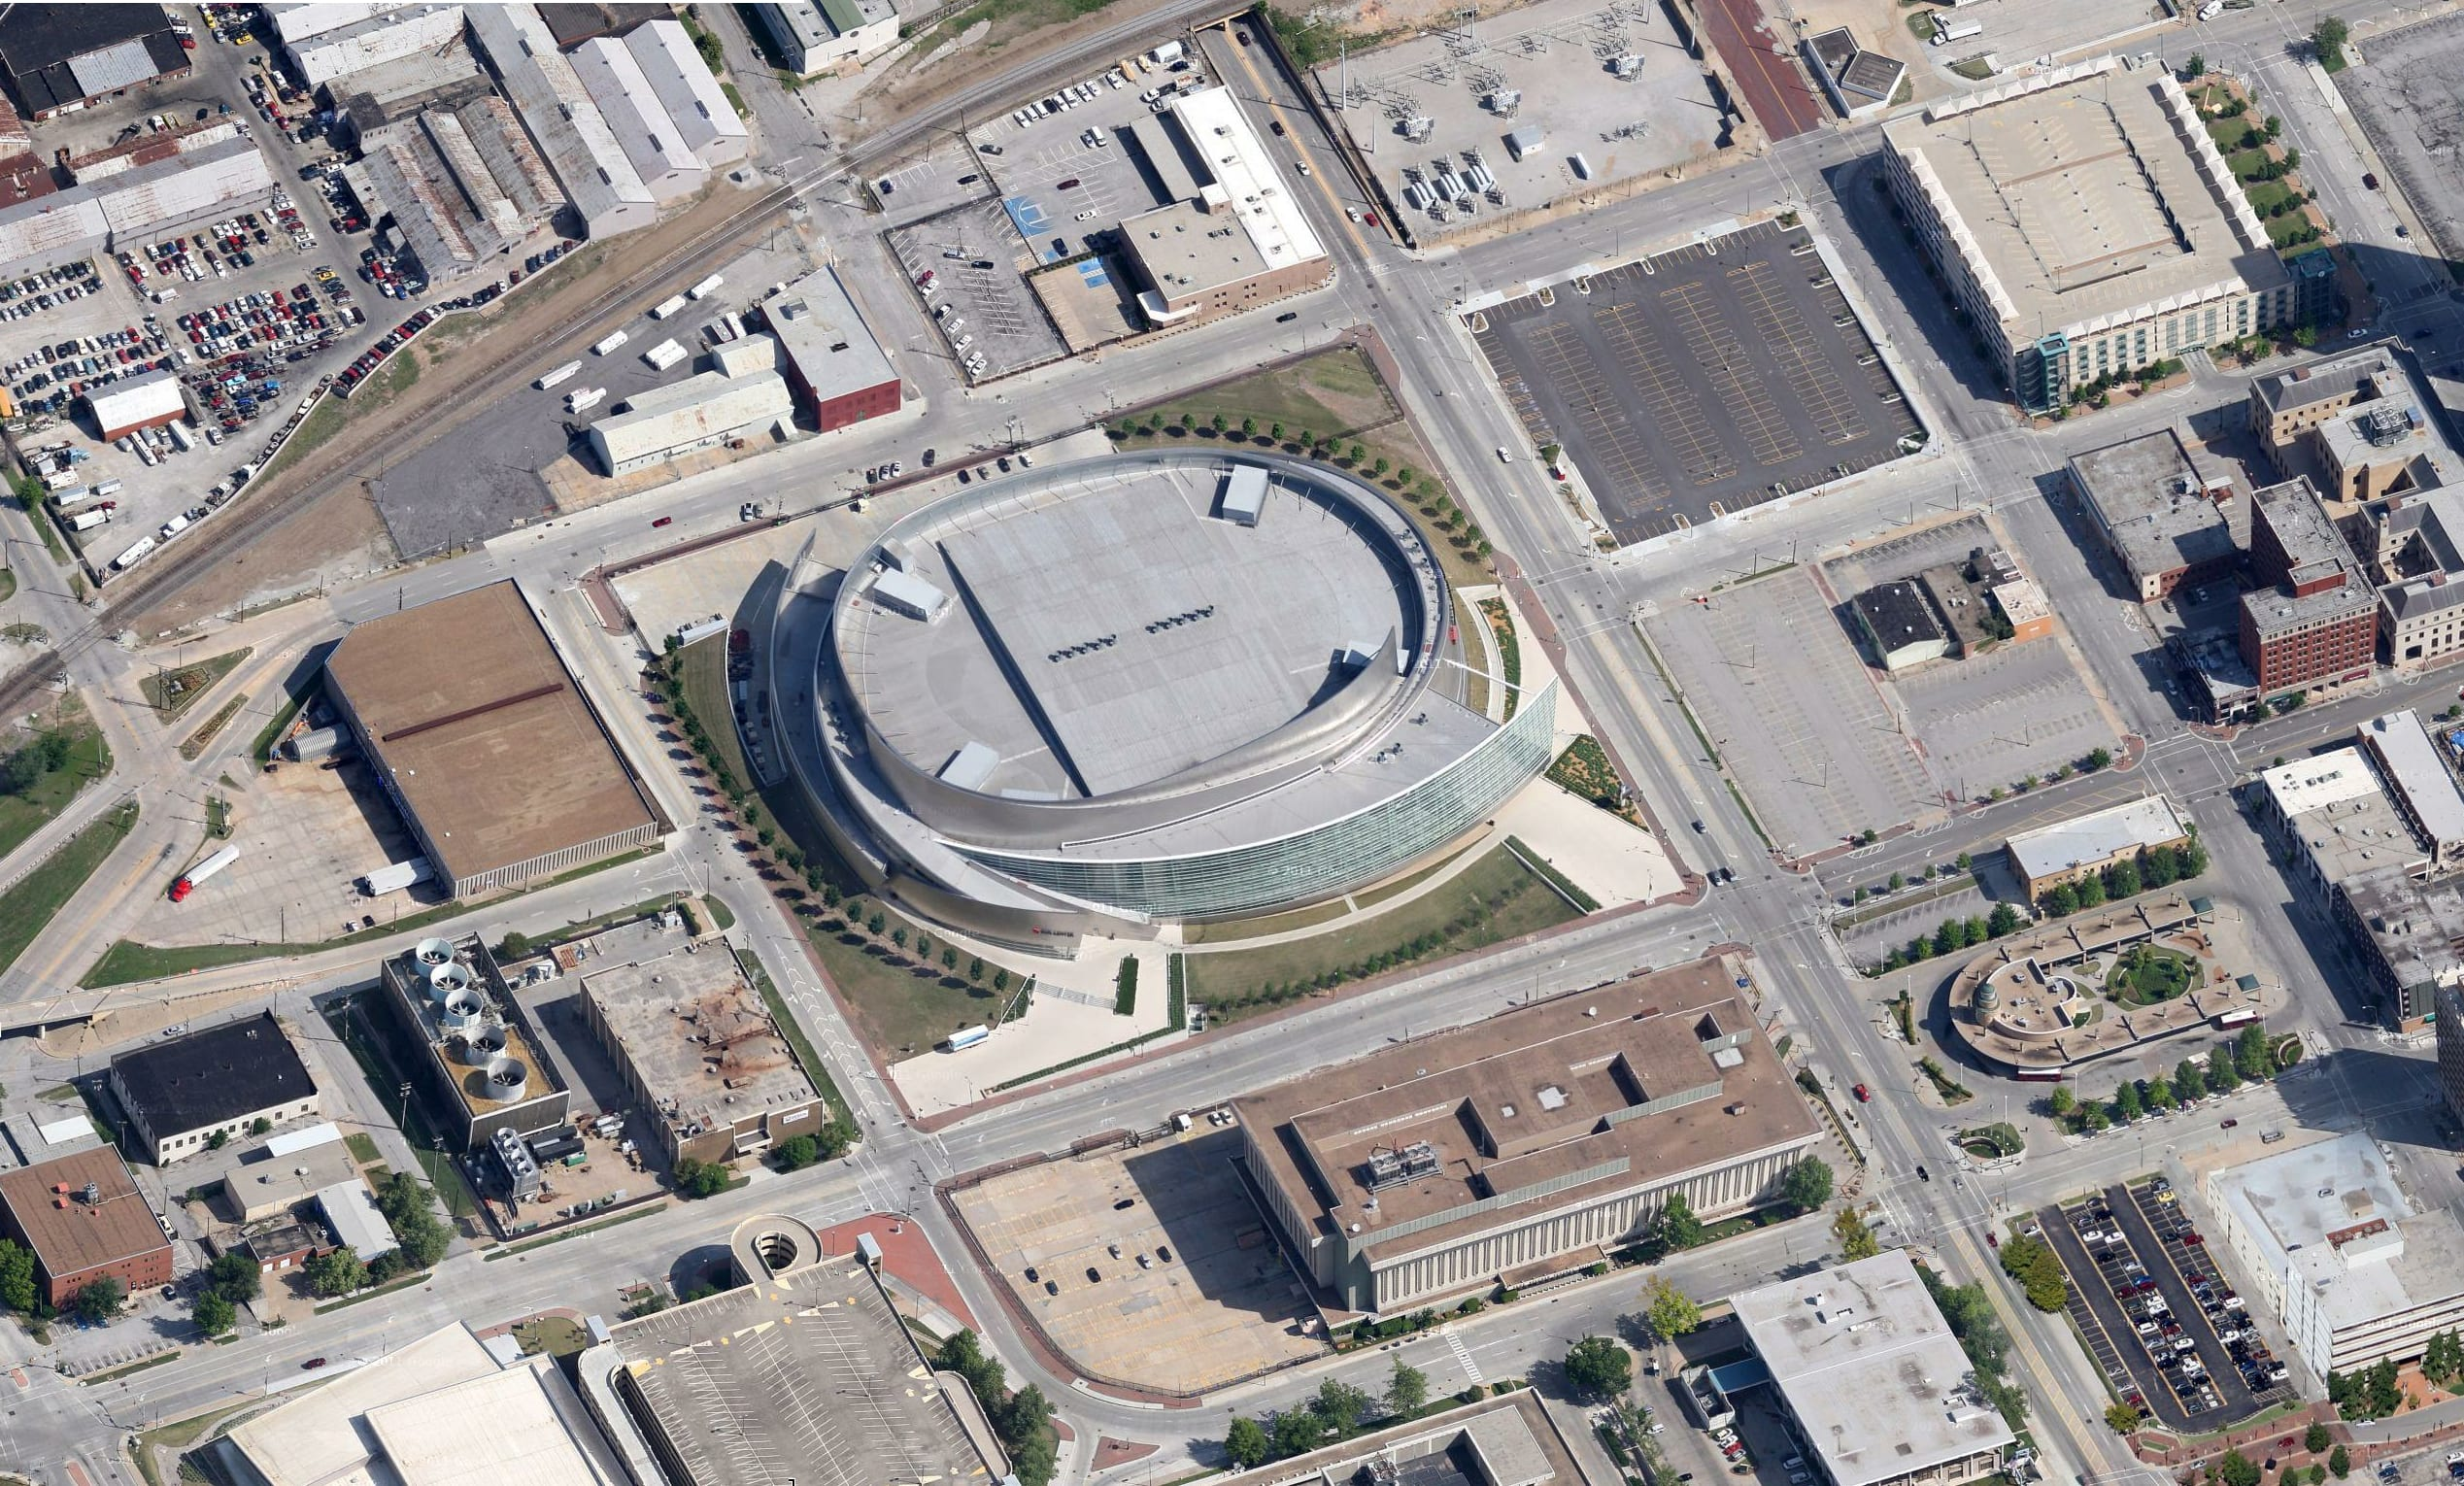 Aerial photo of BOK Center in Oklahoma.